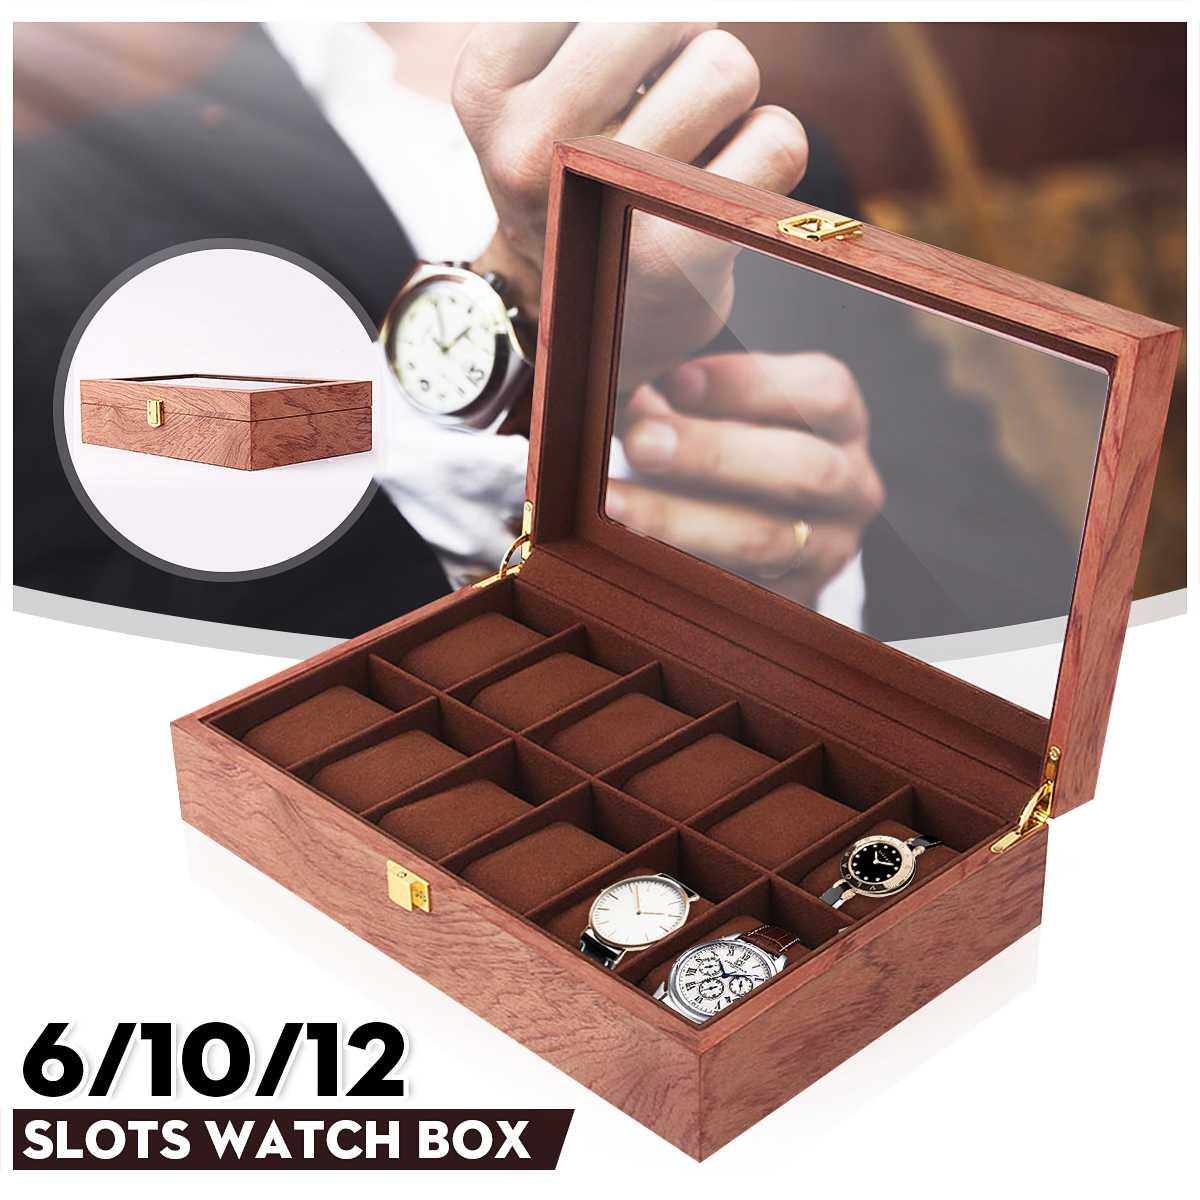 6/10/12 Grids Retro Red Wooden Watch Display Case Durable Packaging Holder Jewelry Collection Storage Watch Organizer Box Casket